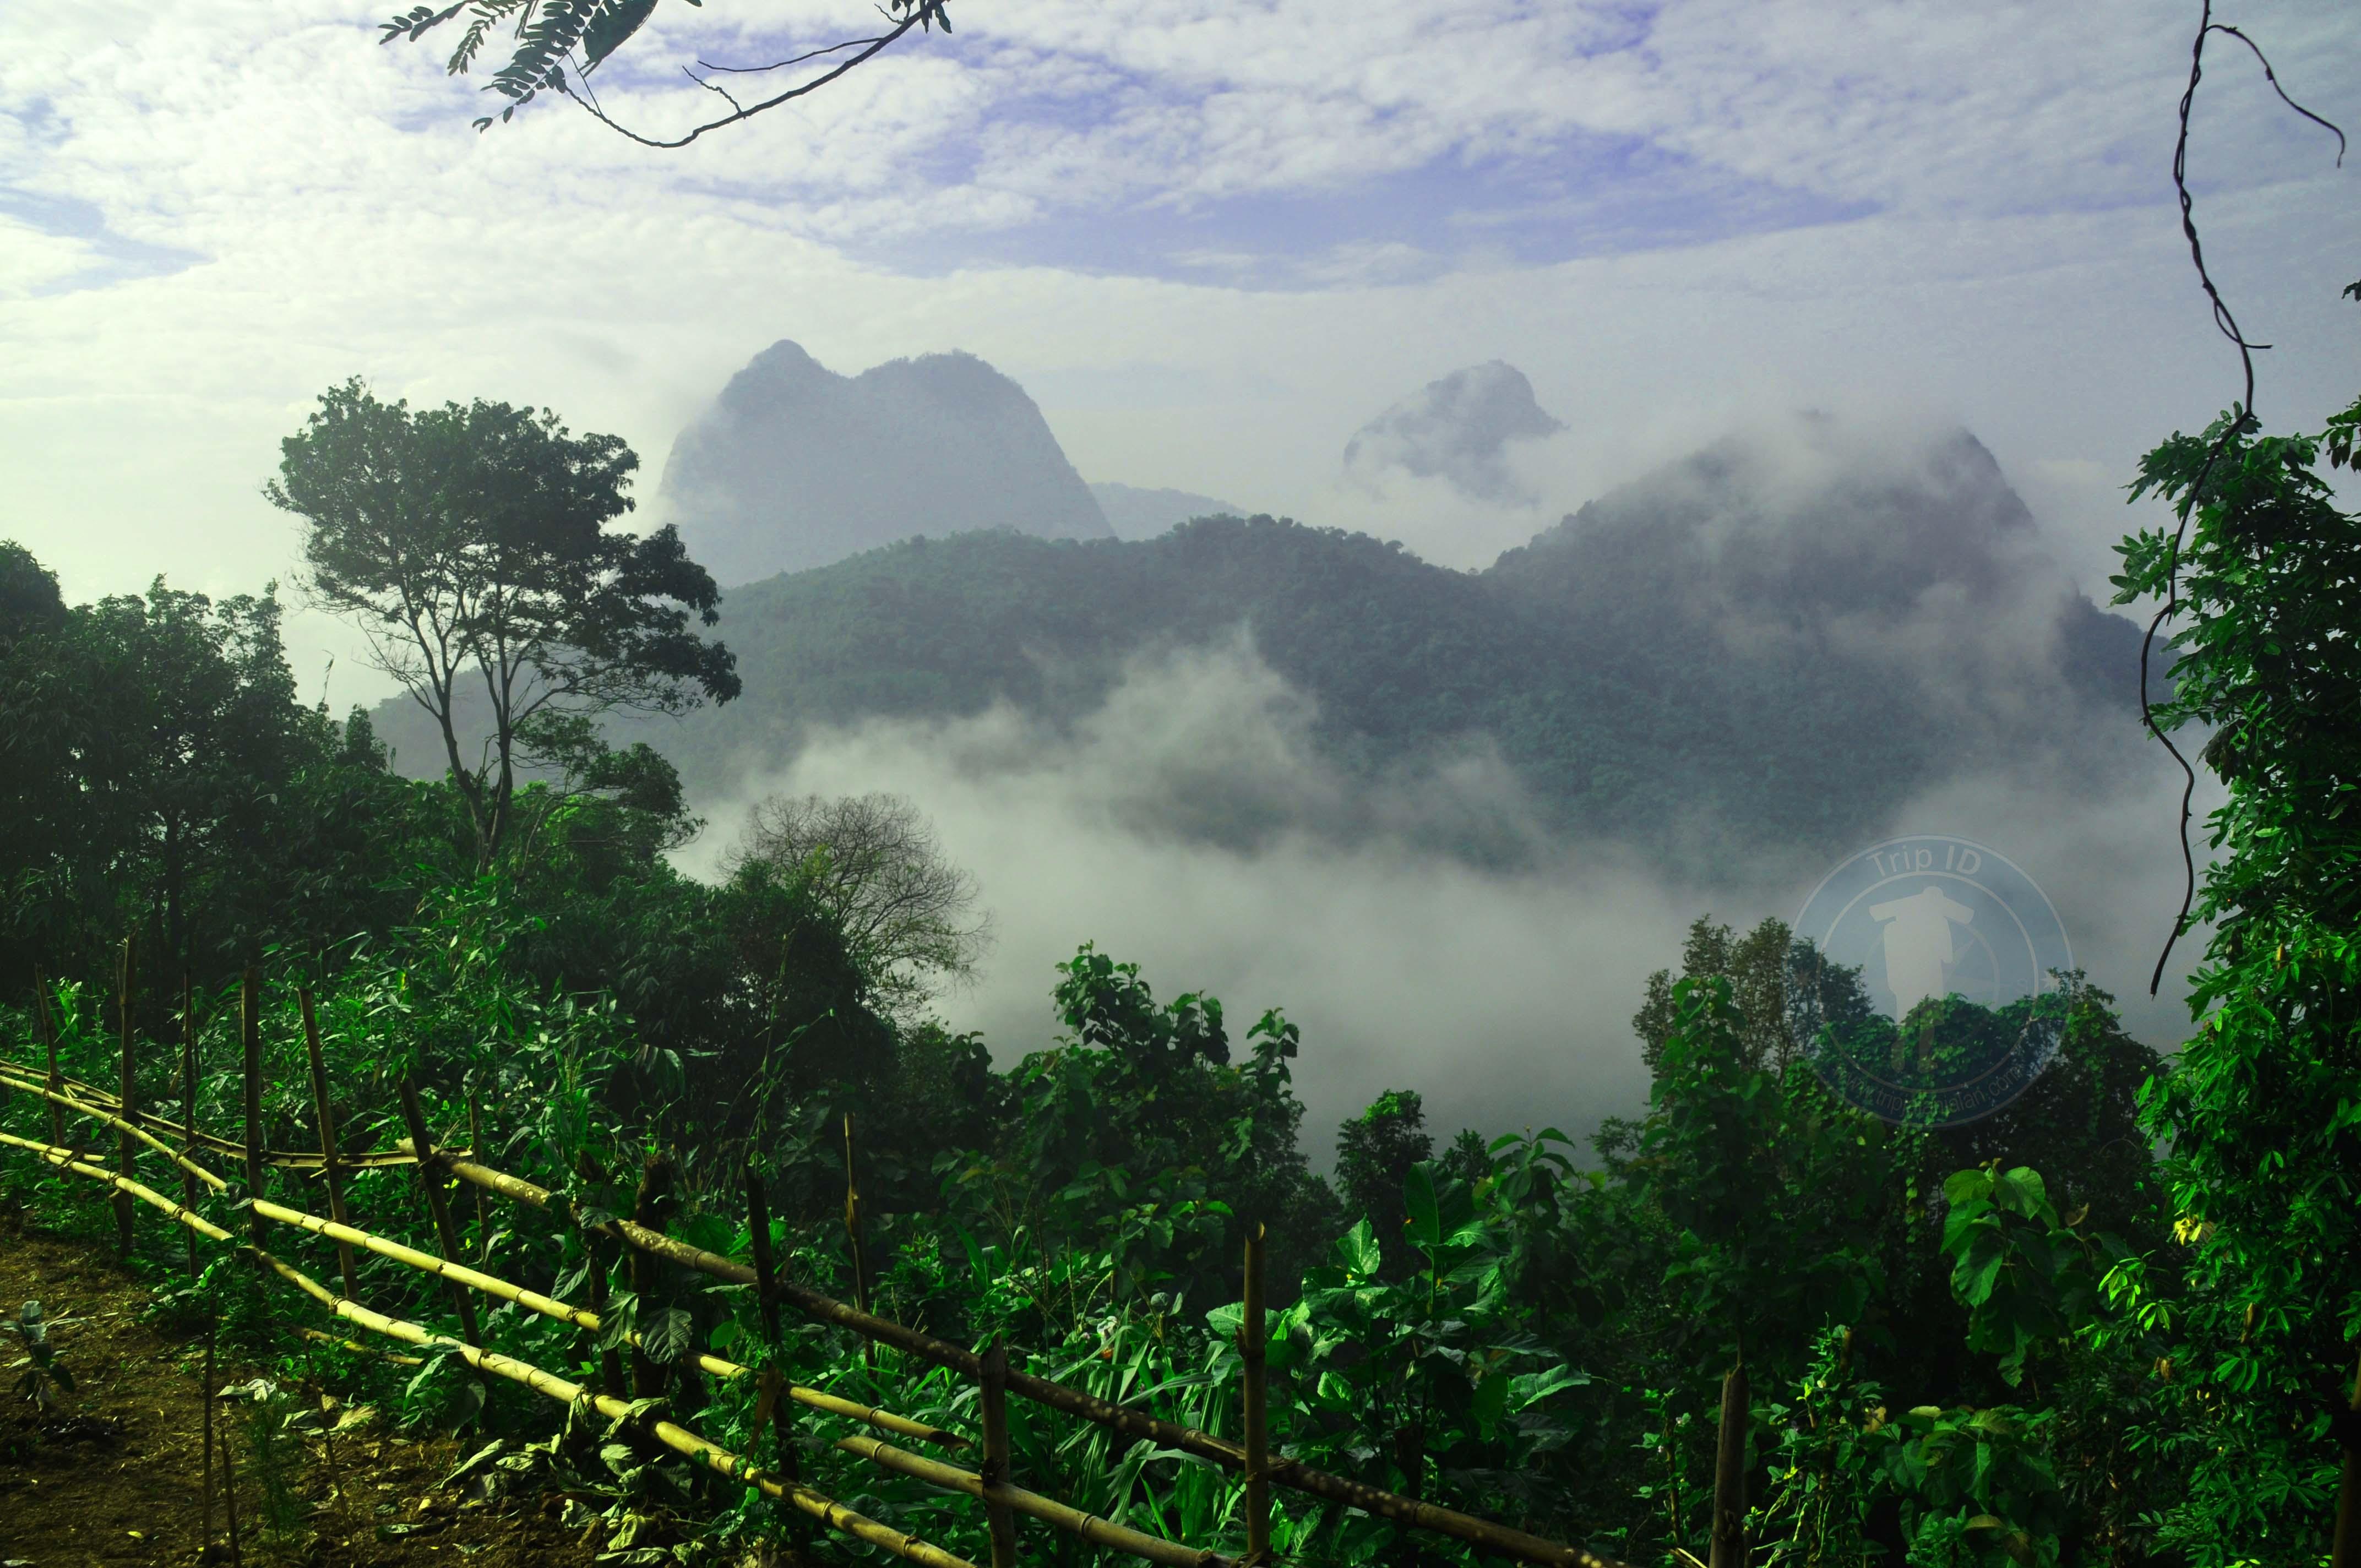 Peresmian gunung cikuray, gunung cikuray ersmi jadi wisata pendakian